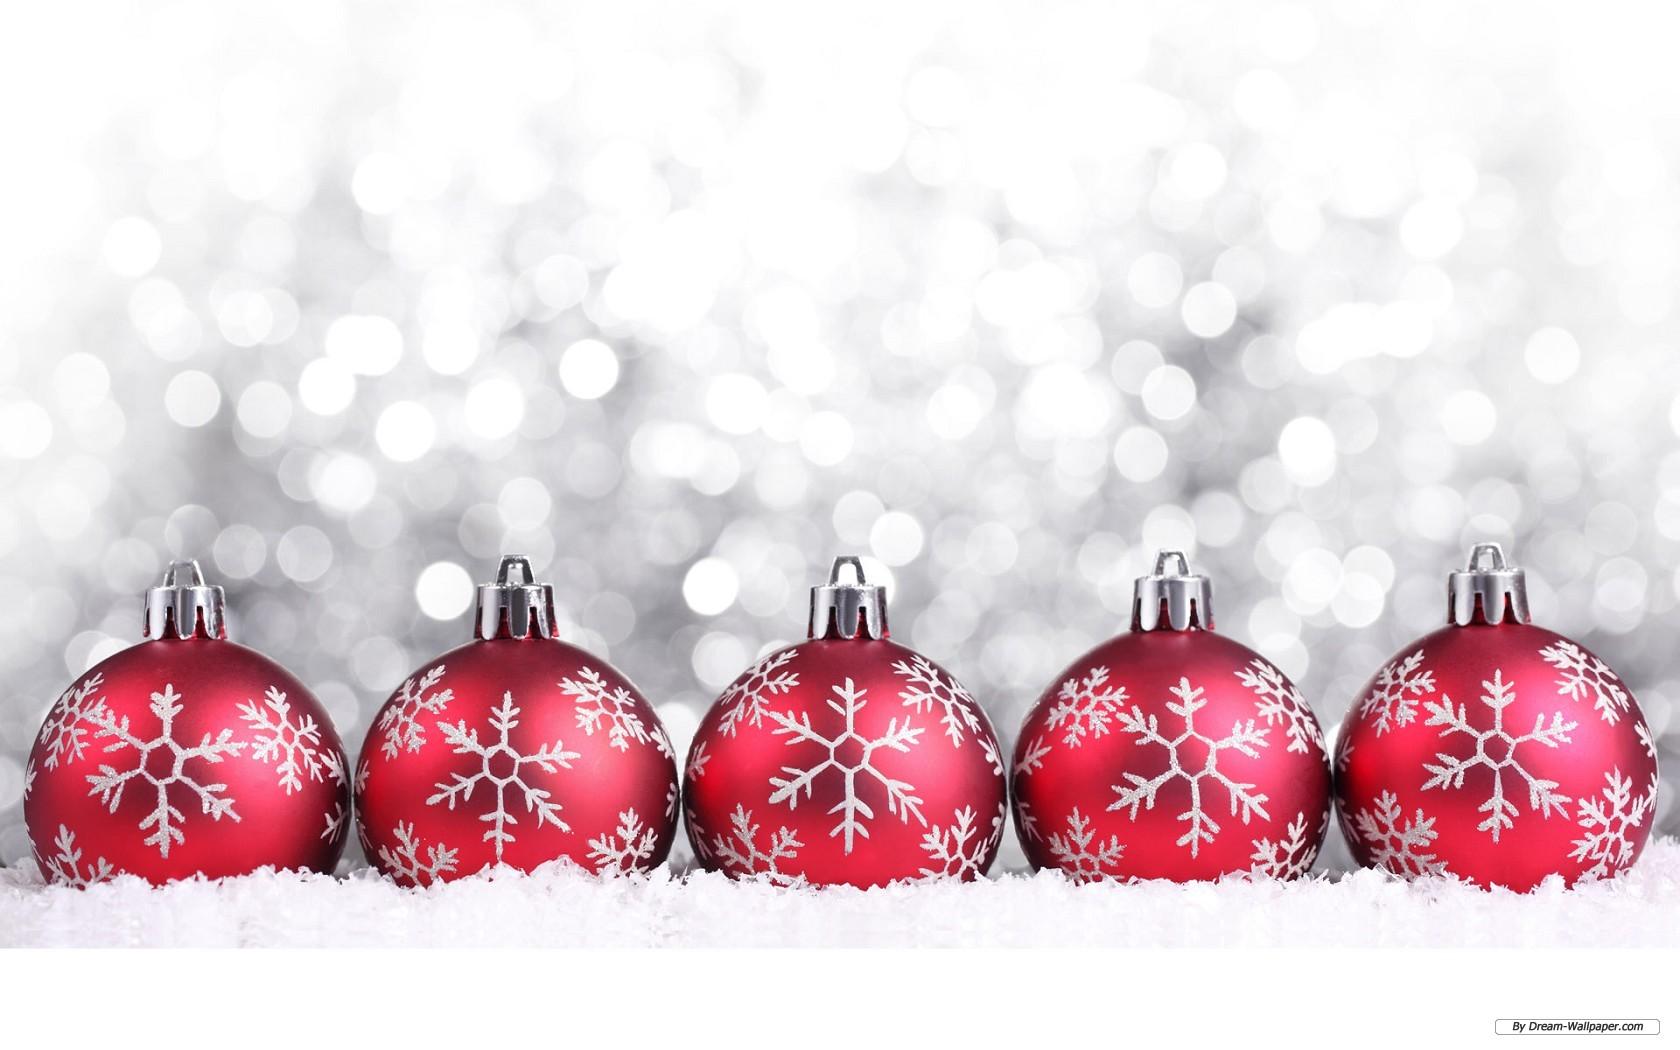 Christmas Ornaments wallpaper 1680x1050 26409 1680x1050